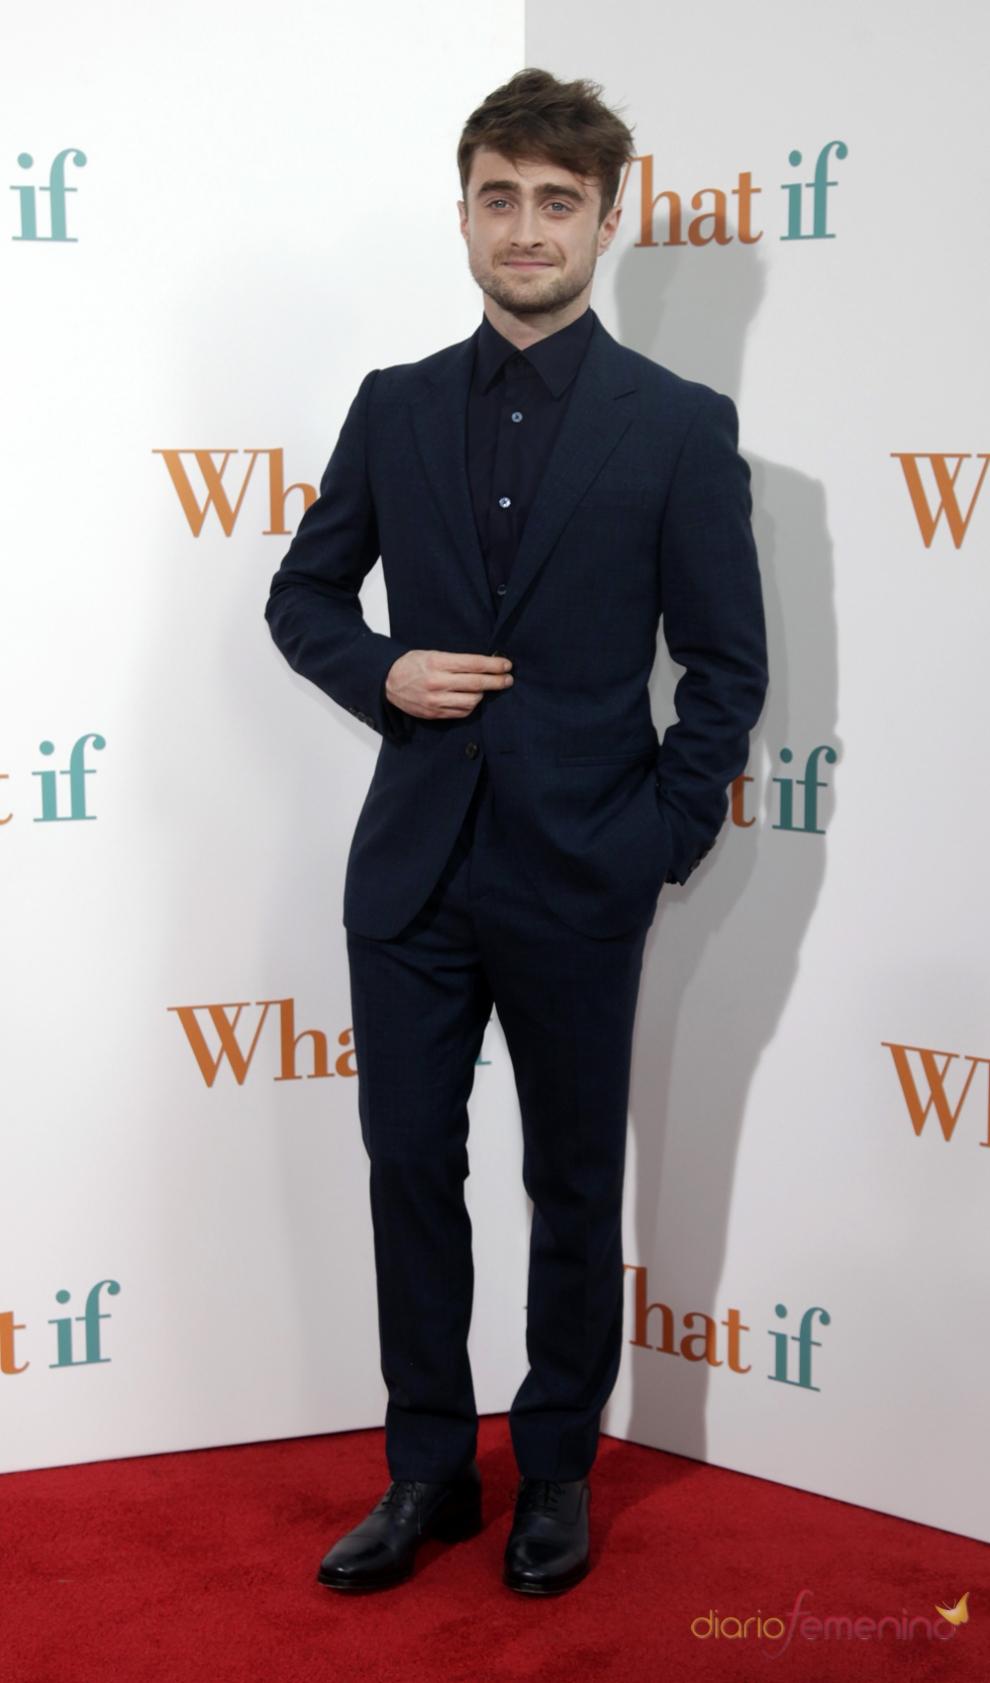 Famosos que casi mueren: Daniel Radcliffe